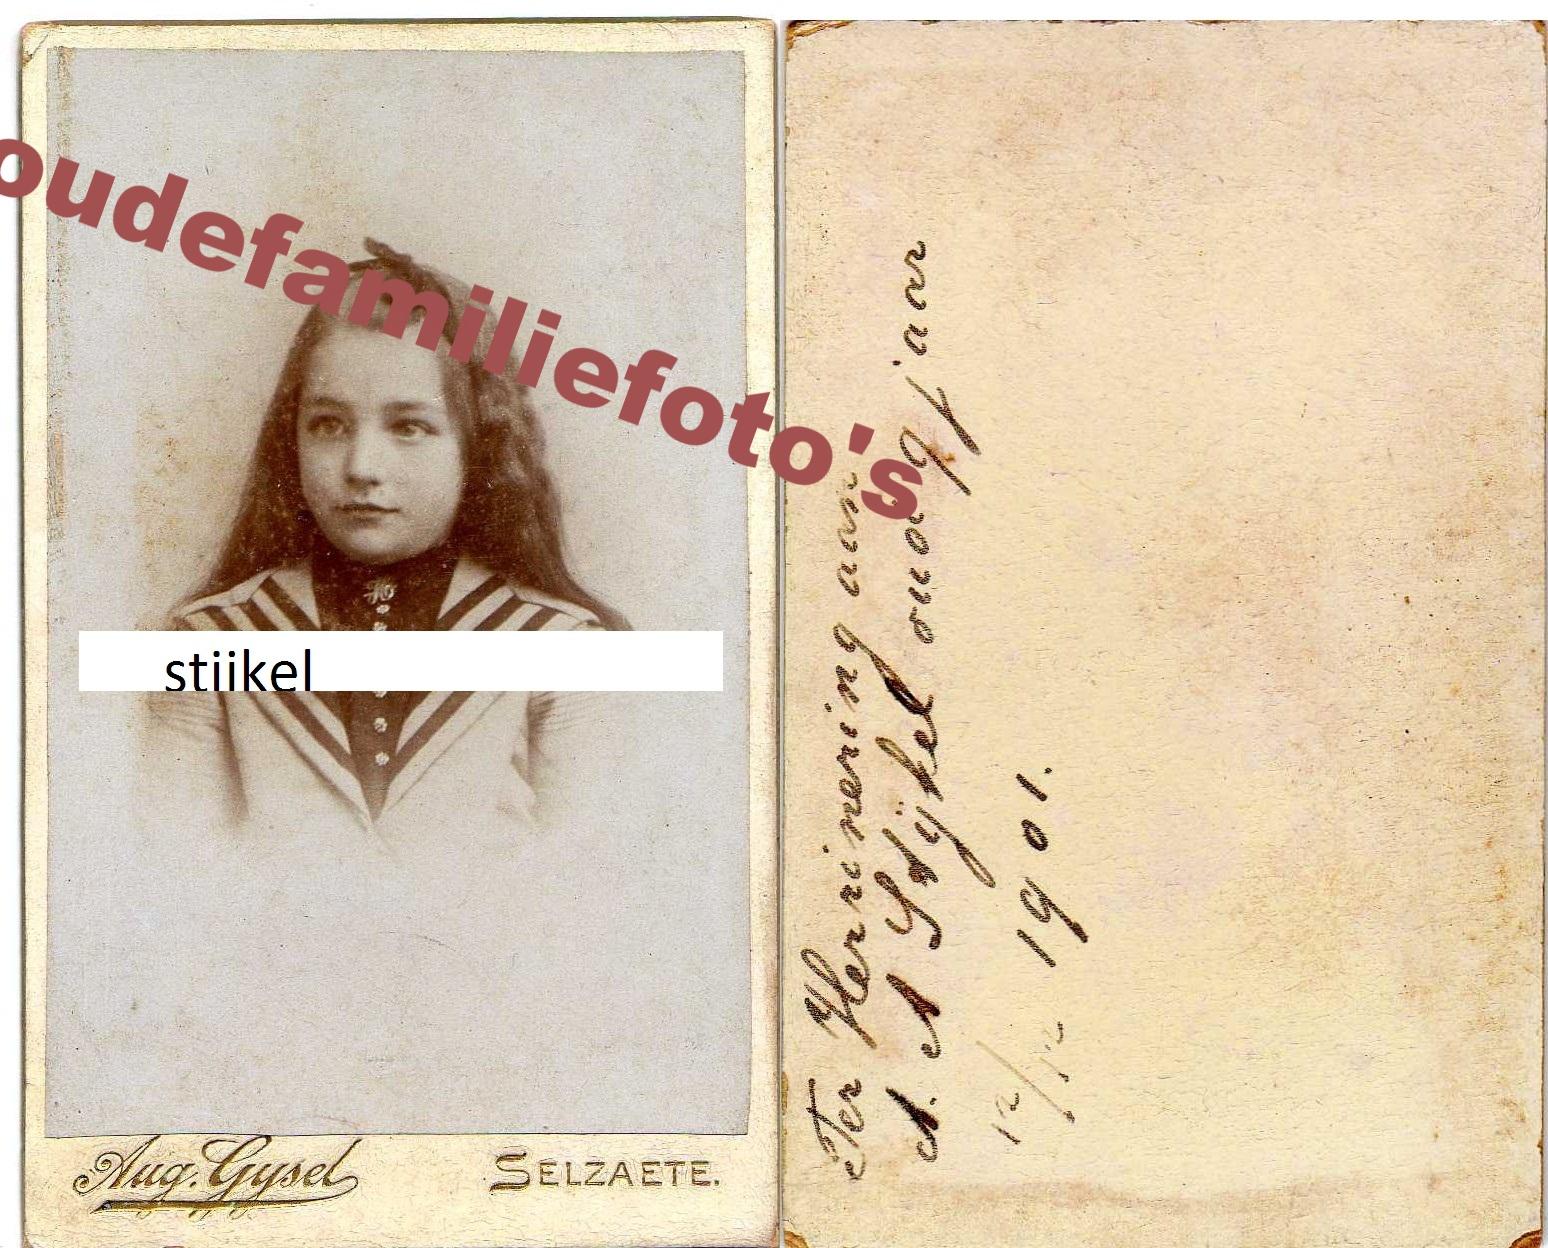 Stijkel, Arendina Anneta. geb: 7-11-1892 Rotterdam. ouders Hermannus en Tetje Bakker. € 2,50